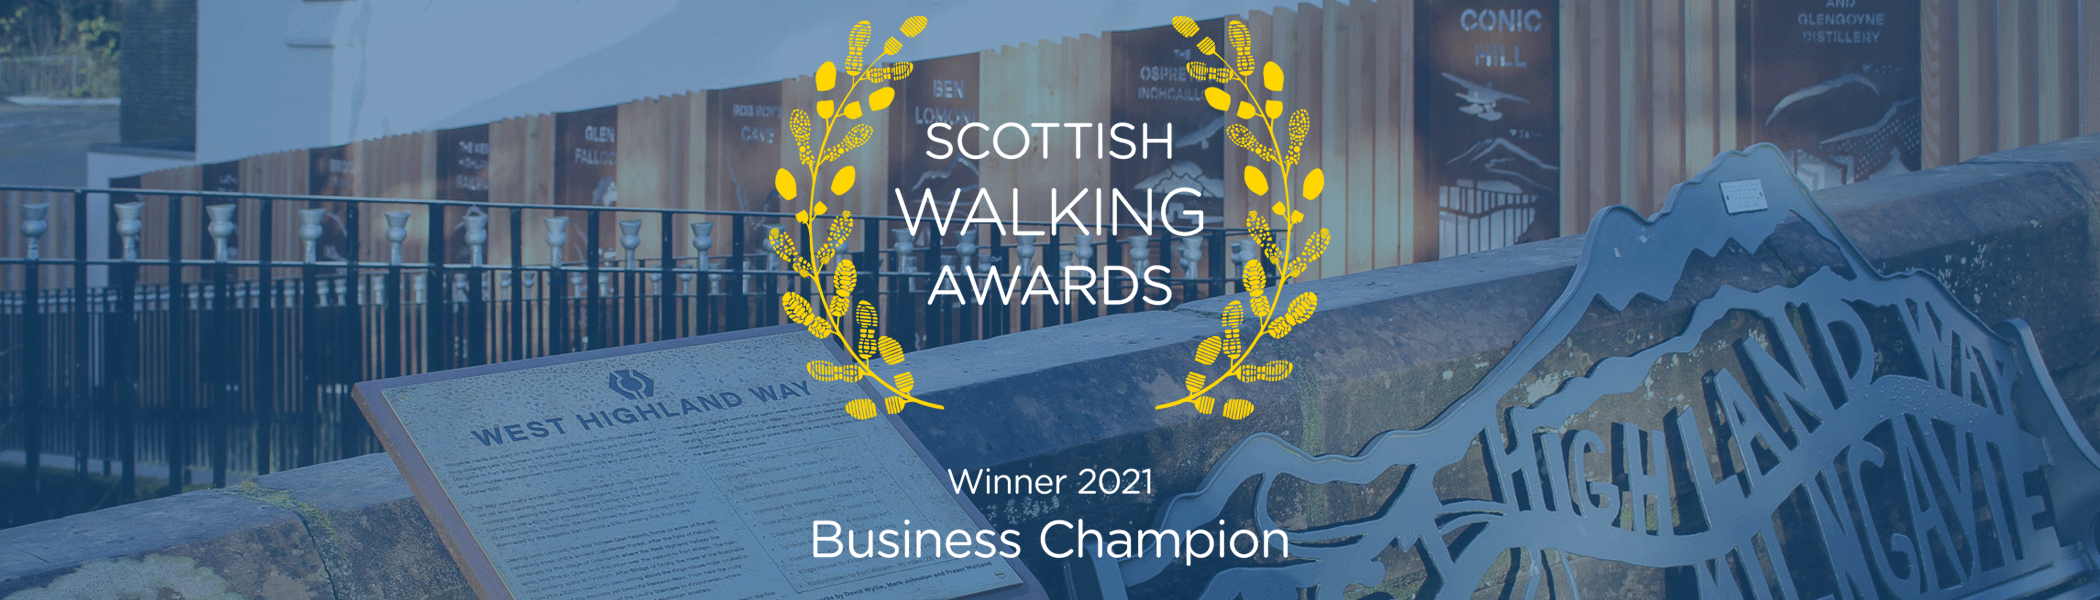 Milngavie is Scottish Walking Awards business Winner 2021